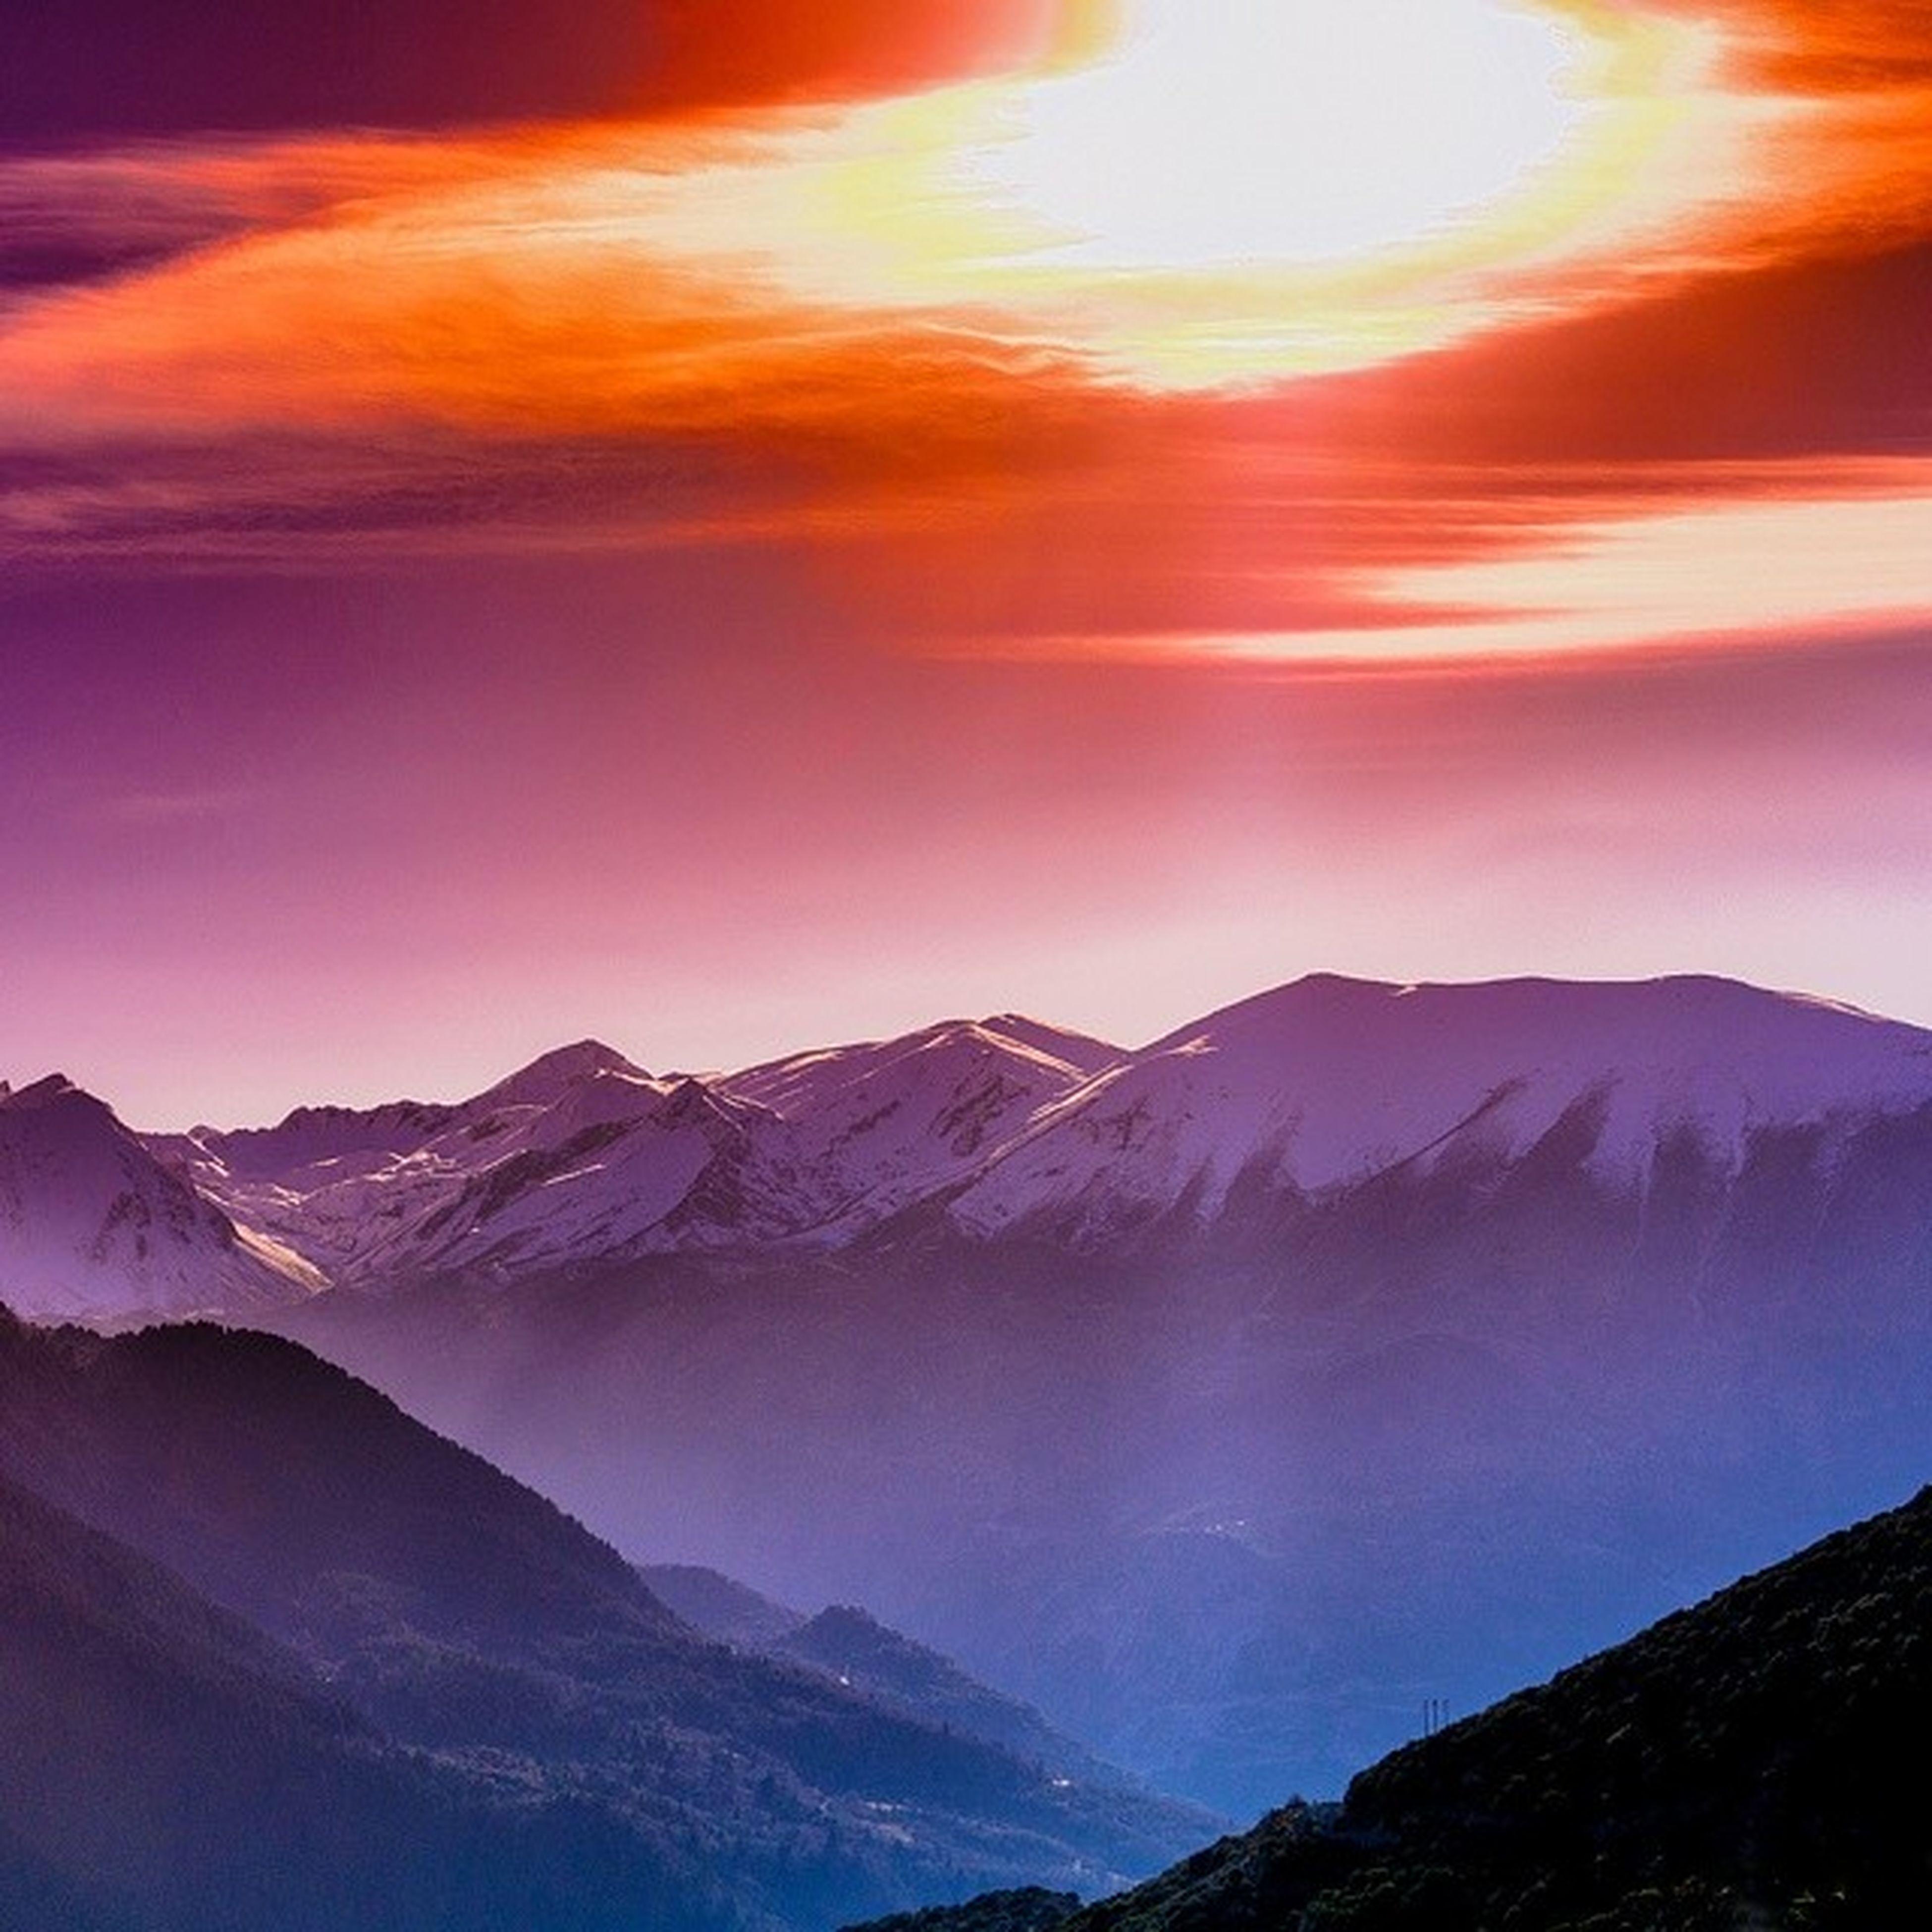 mountain, mountain range, scenics, tranquil scene, snow, tranquility, beauty in nature, winter, cold temperature, sunset, snowcapped mountain, nature, sky, landscape, idyllic, season, weather, majestic, non-urban scene, cloud - sky